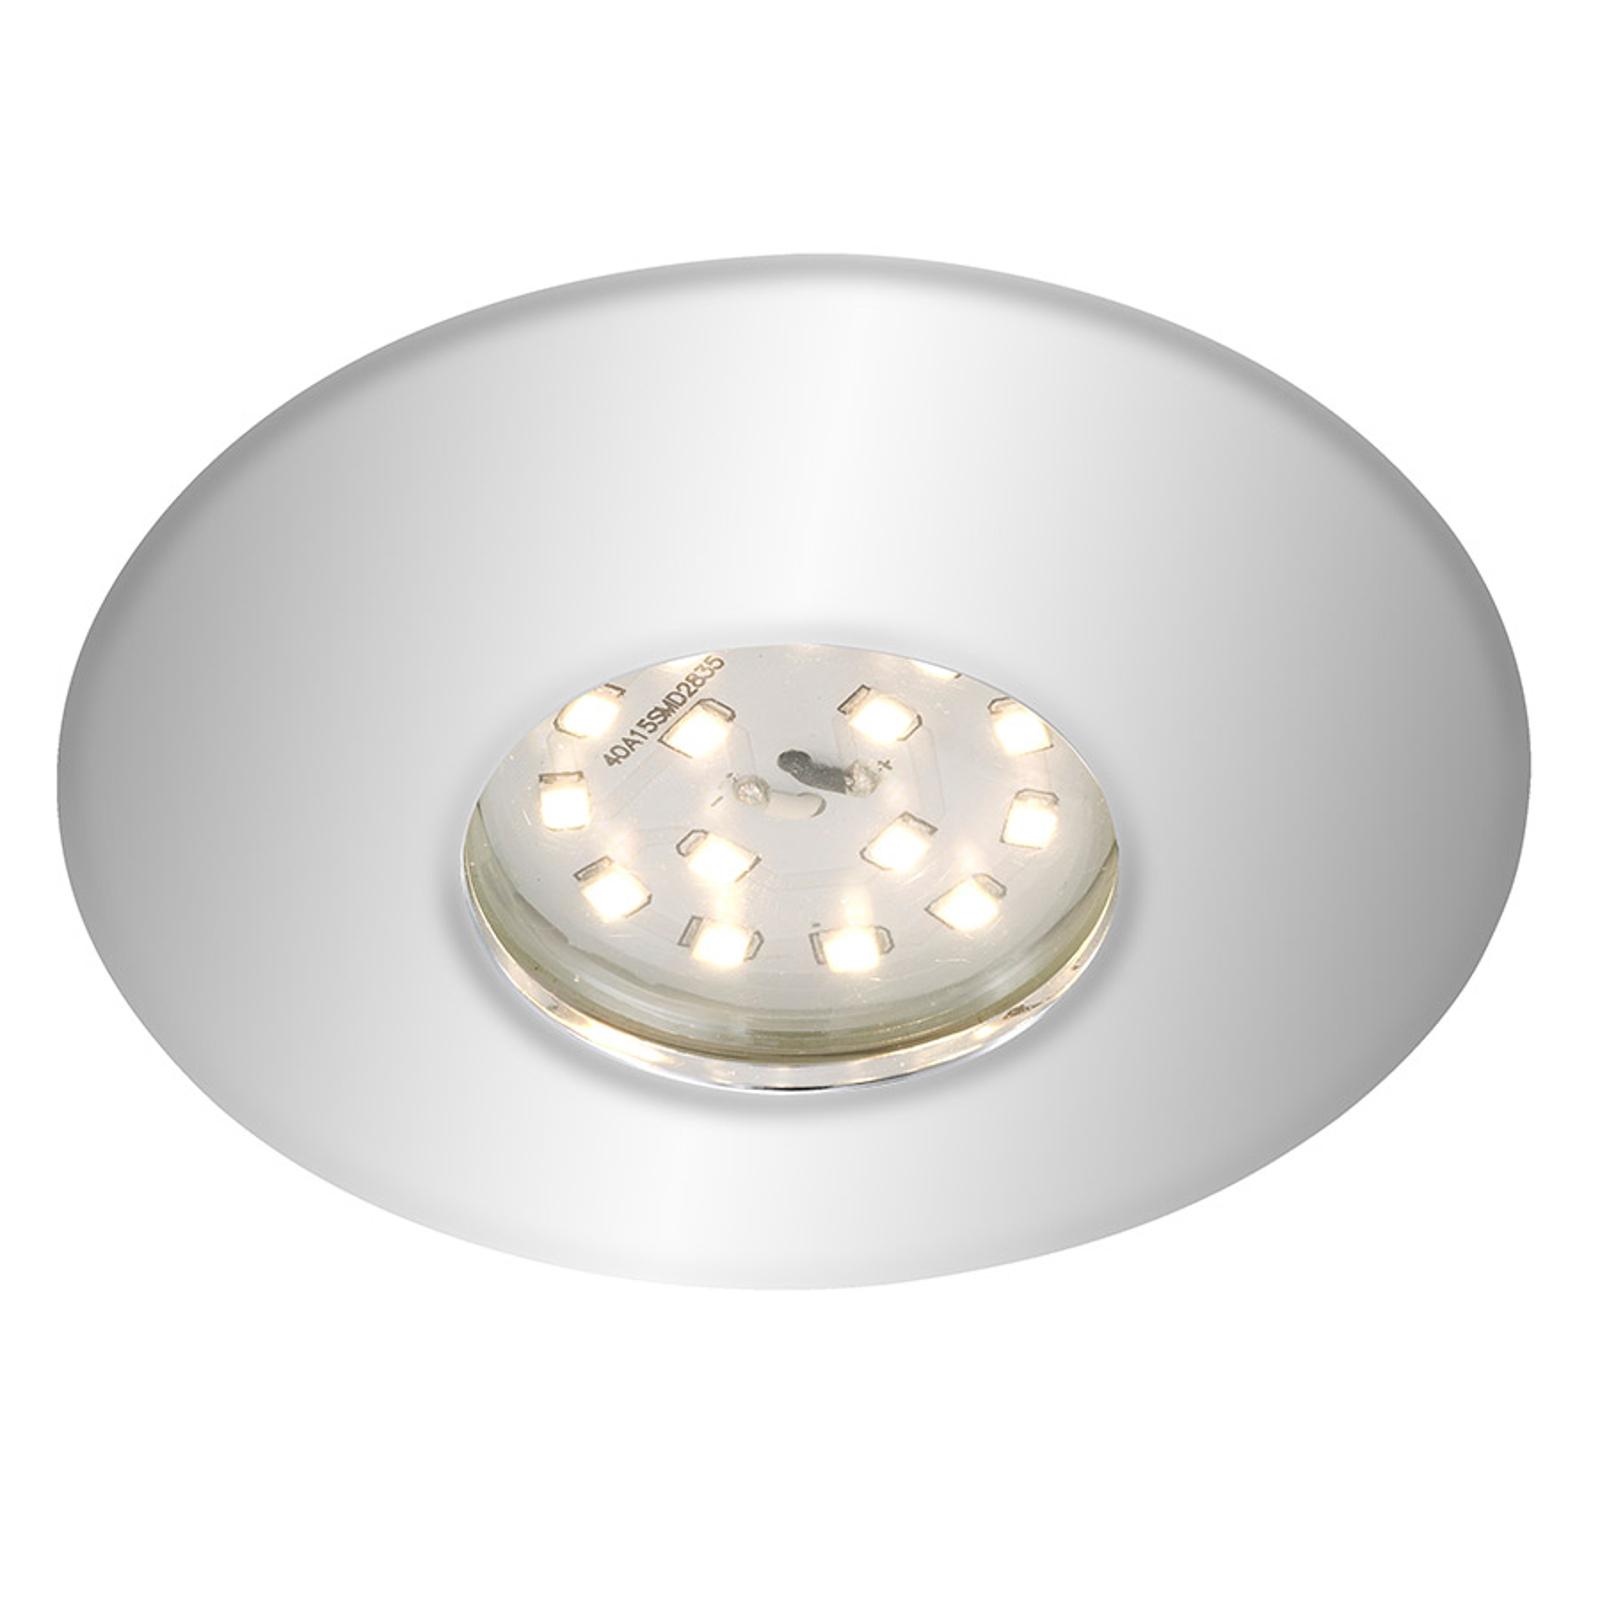 Downlight LED cromato Shower, IP65